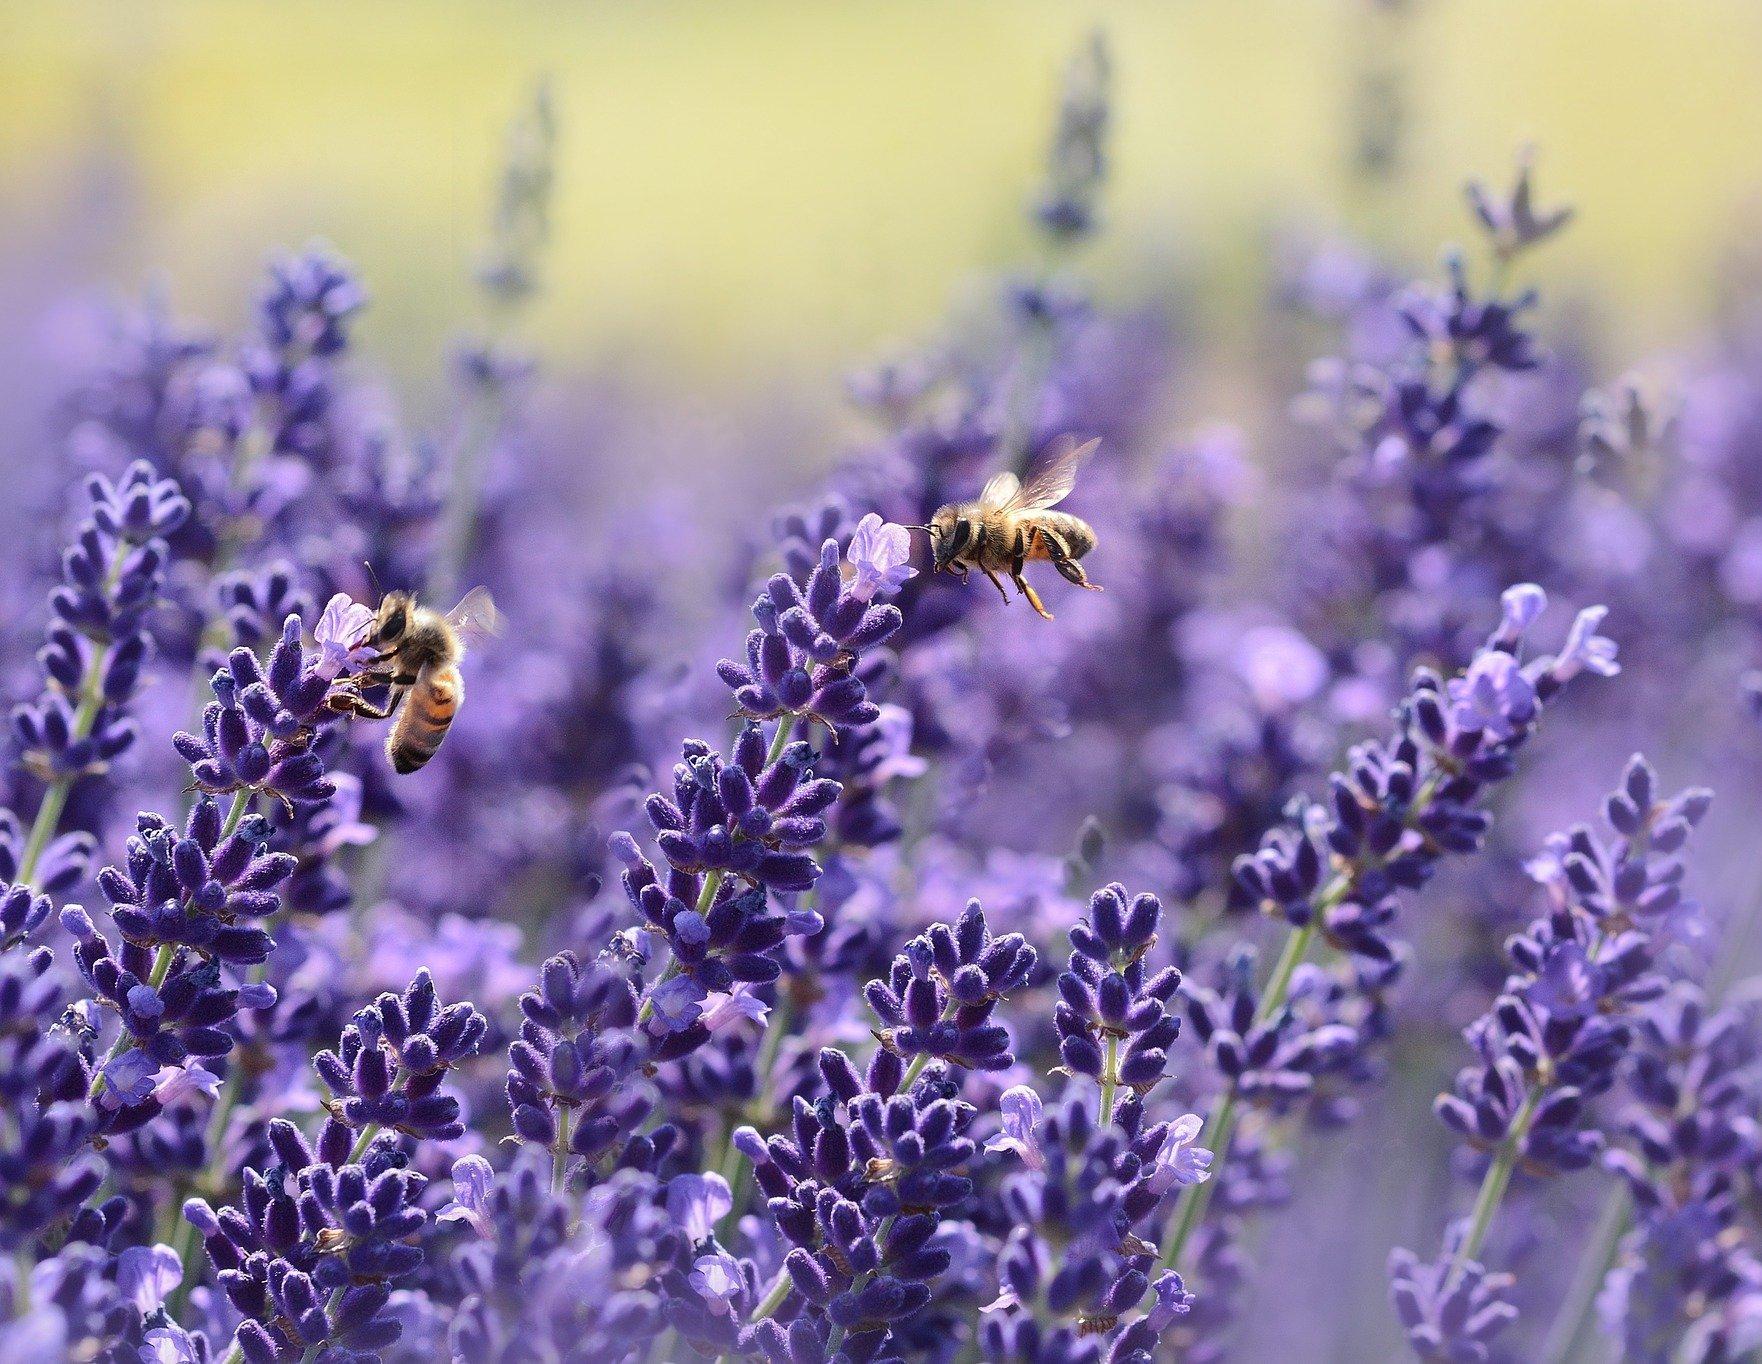 lavenders-1537694_1920-aspect-ratio-46x35.6